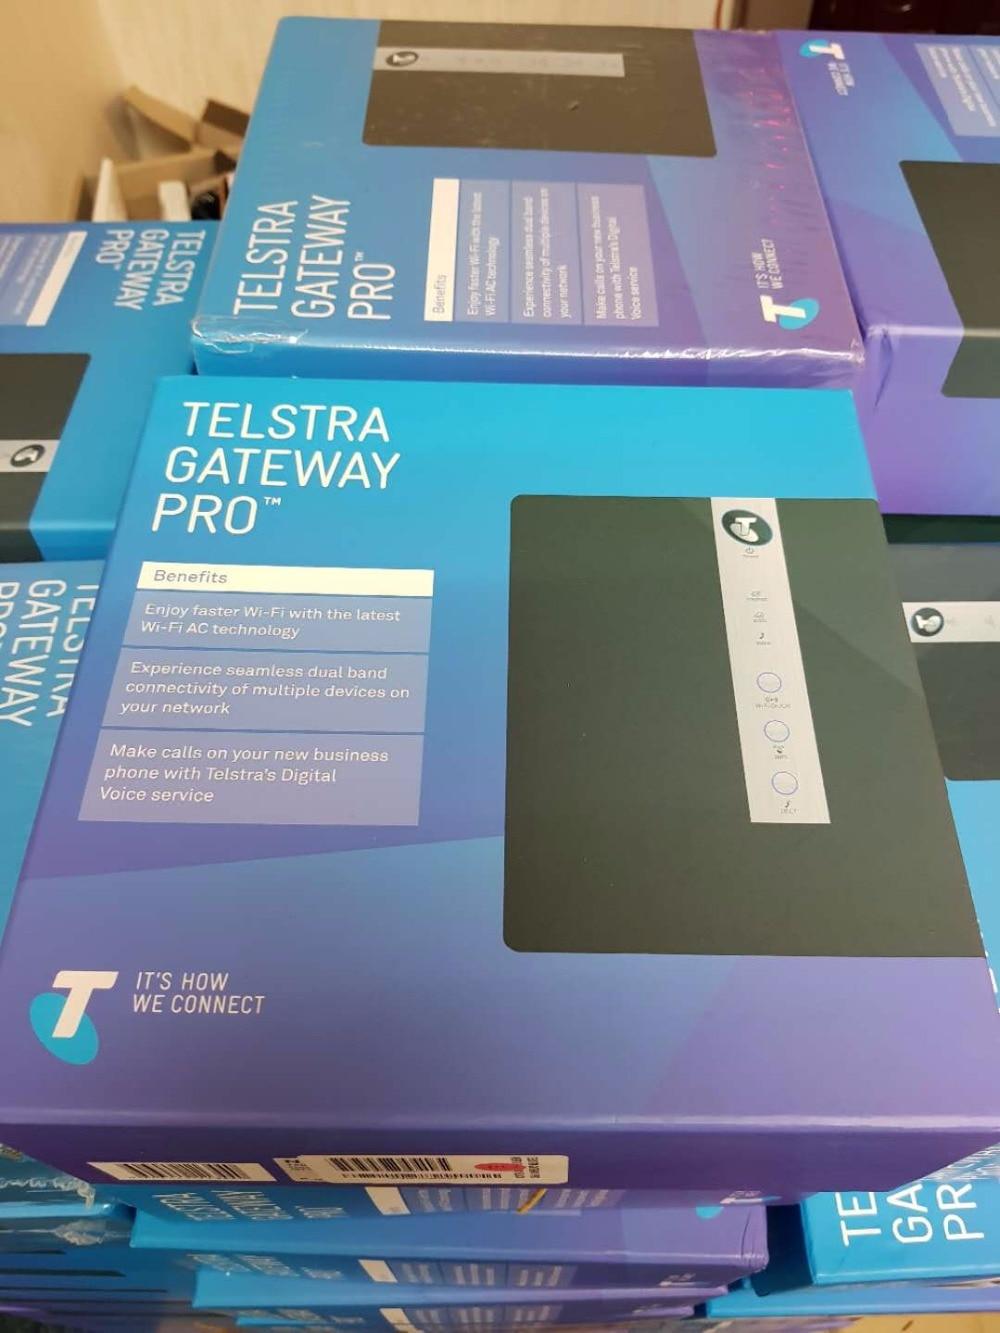 Telstra gateway Pro (NETGEAR v7610) Новый в коробке NBN маршрутизатор модем ...